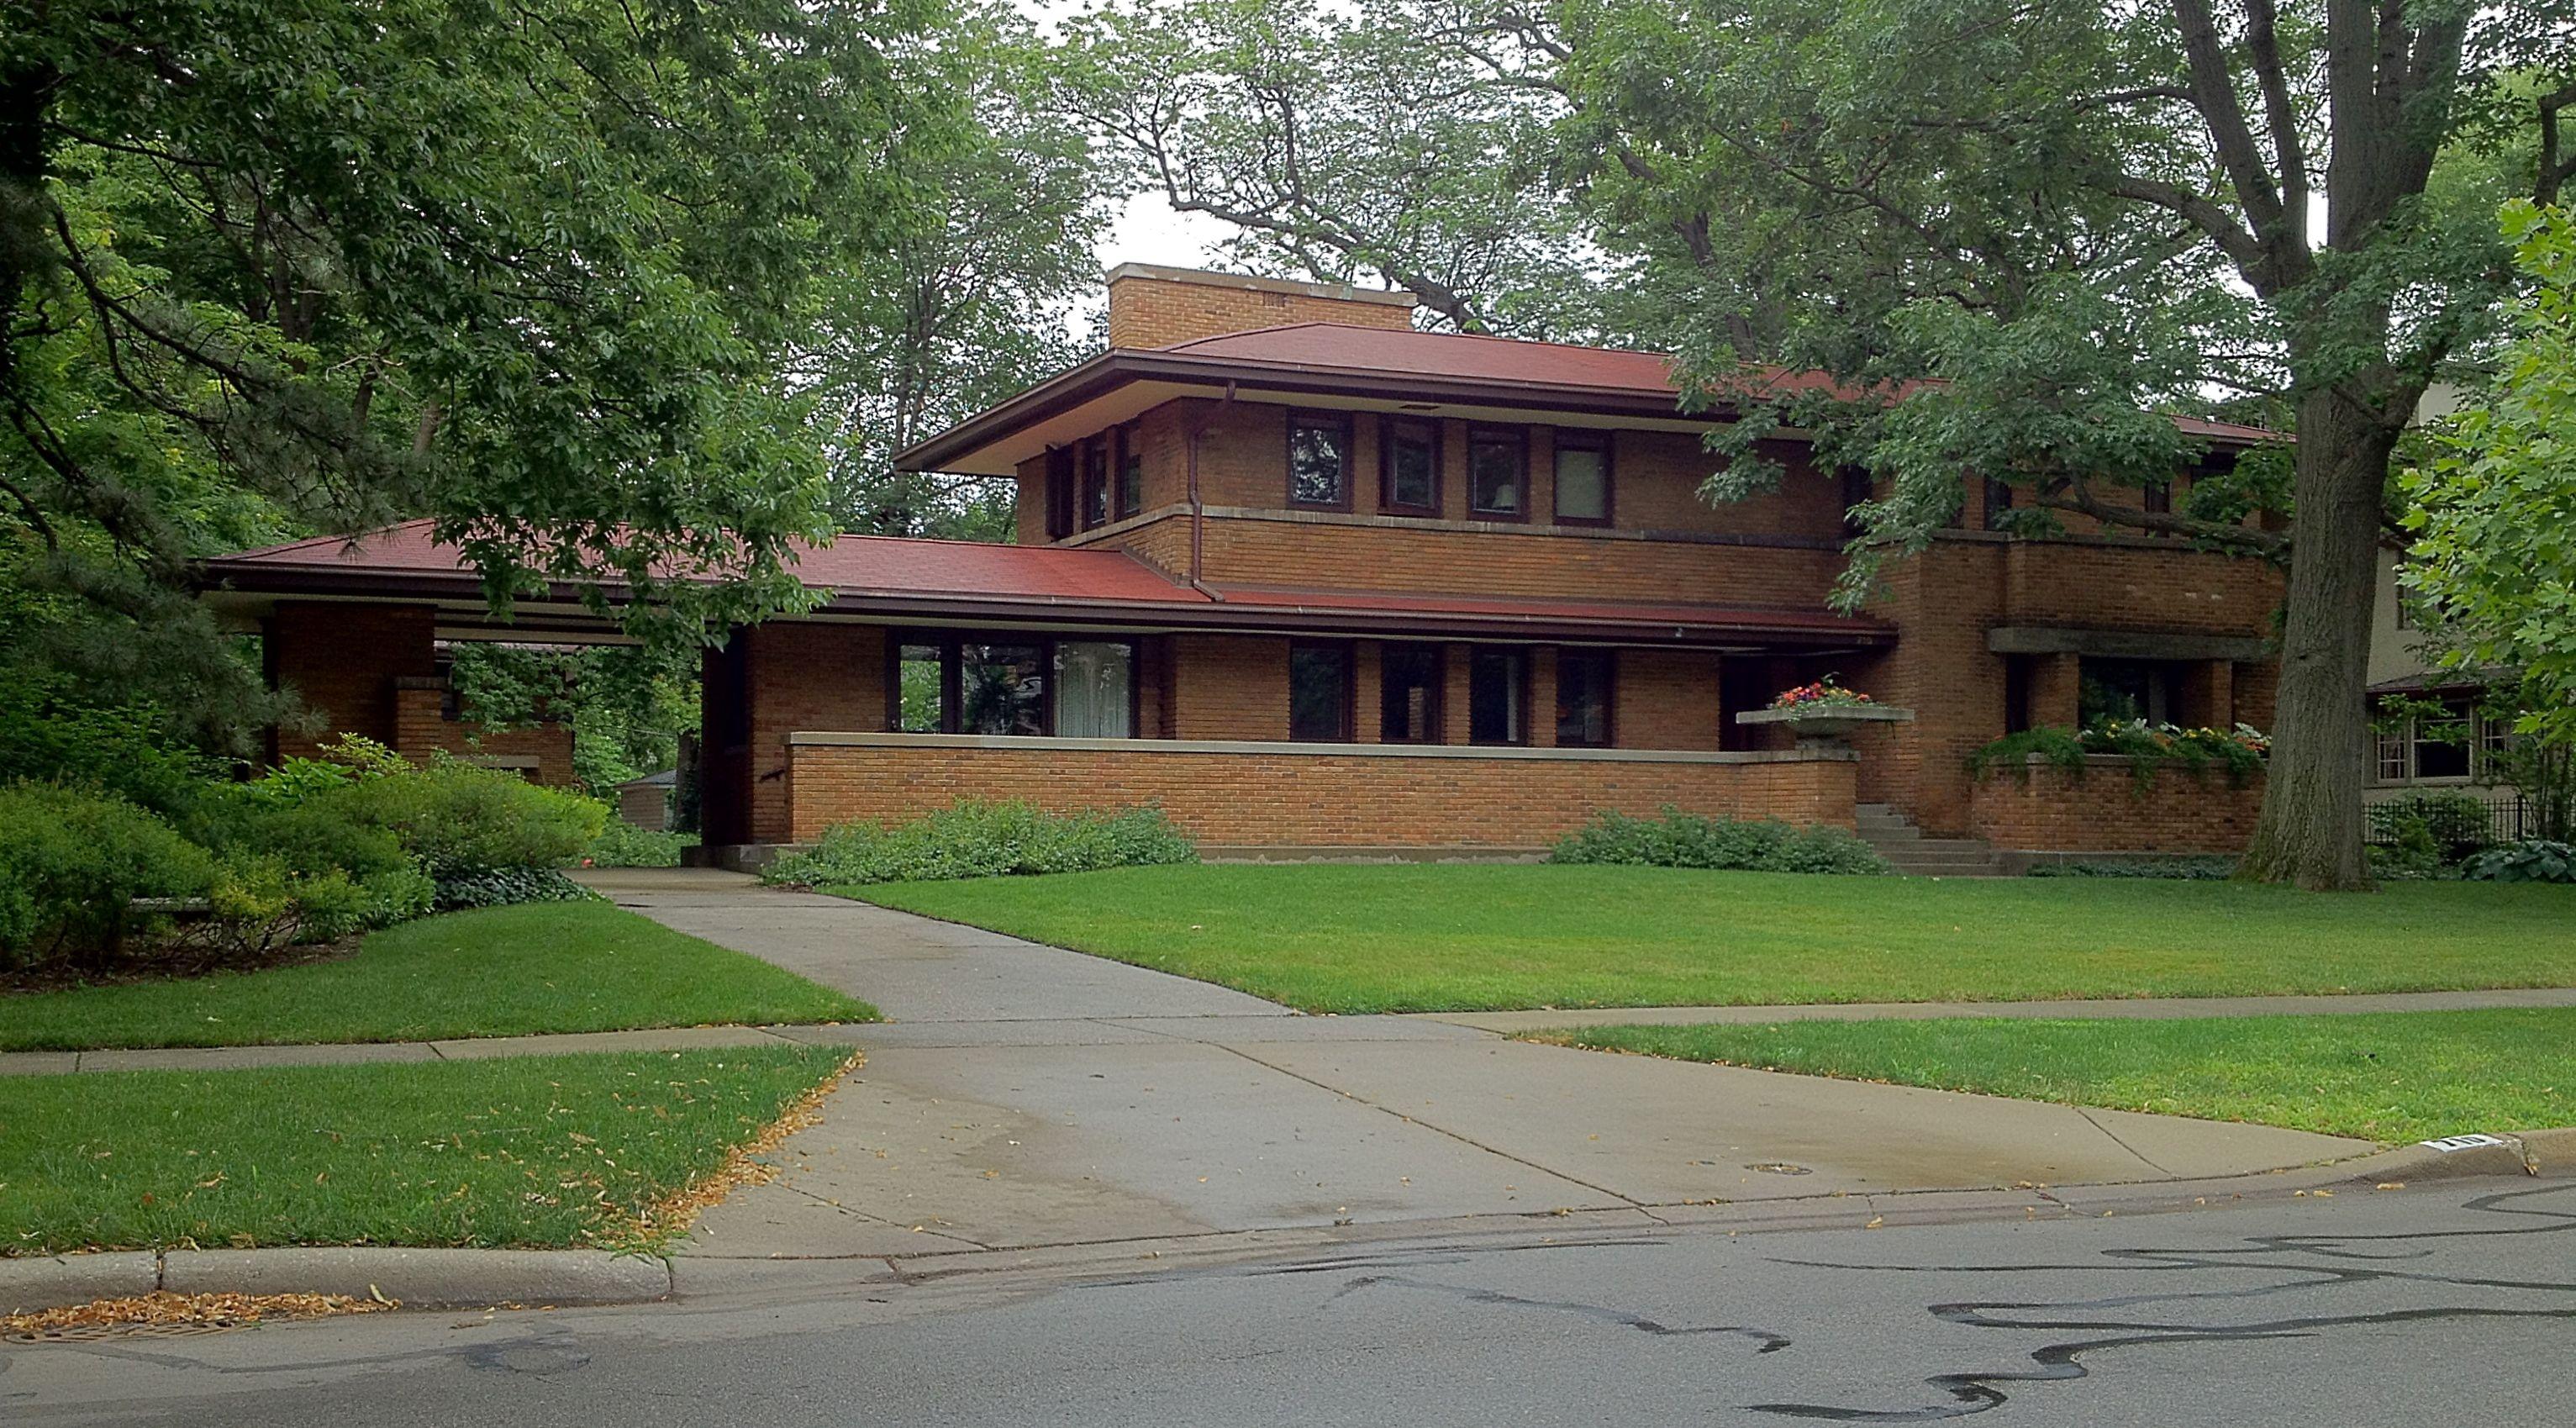 Frank Lloyd Wright S Oak Park Illinois Designs The Prairie Period 1900 1913 Frank Lloyd Wright Homes Frank Lloyd Wright Style Frank Lloyd Wright